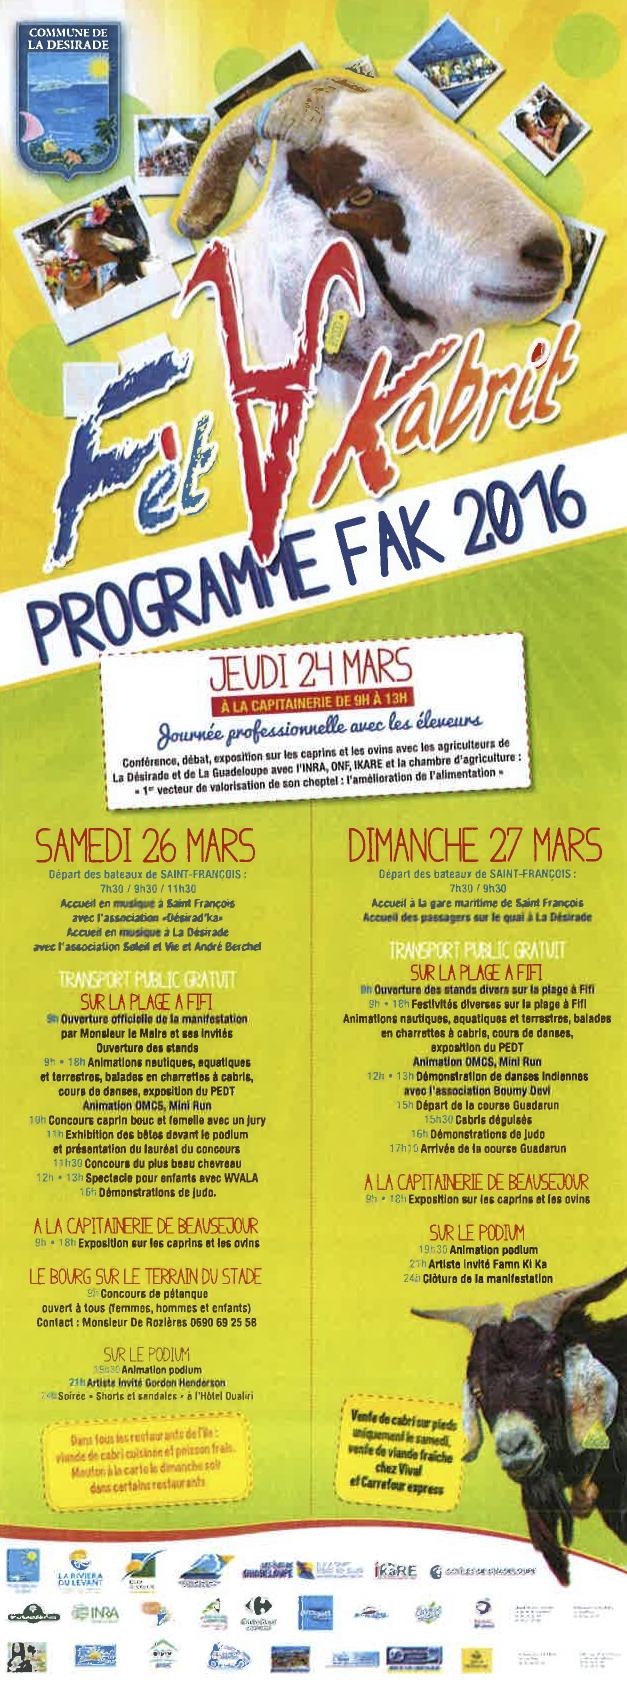 FAK 2016 Programme